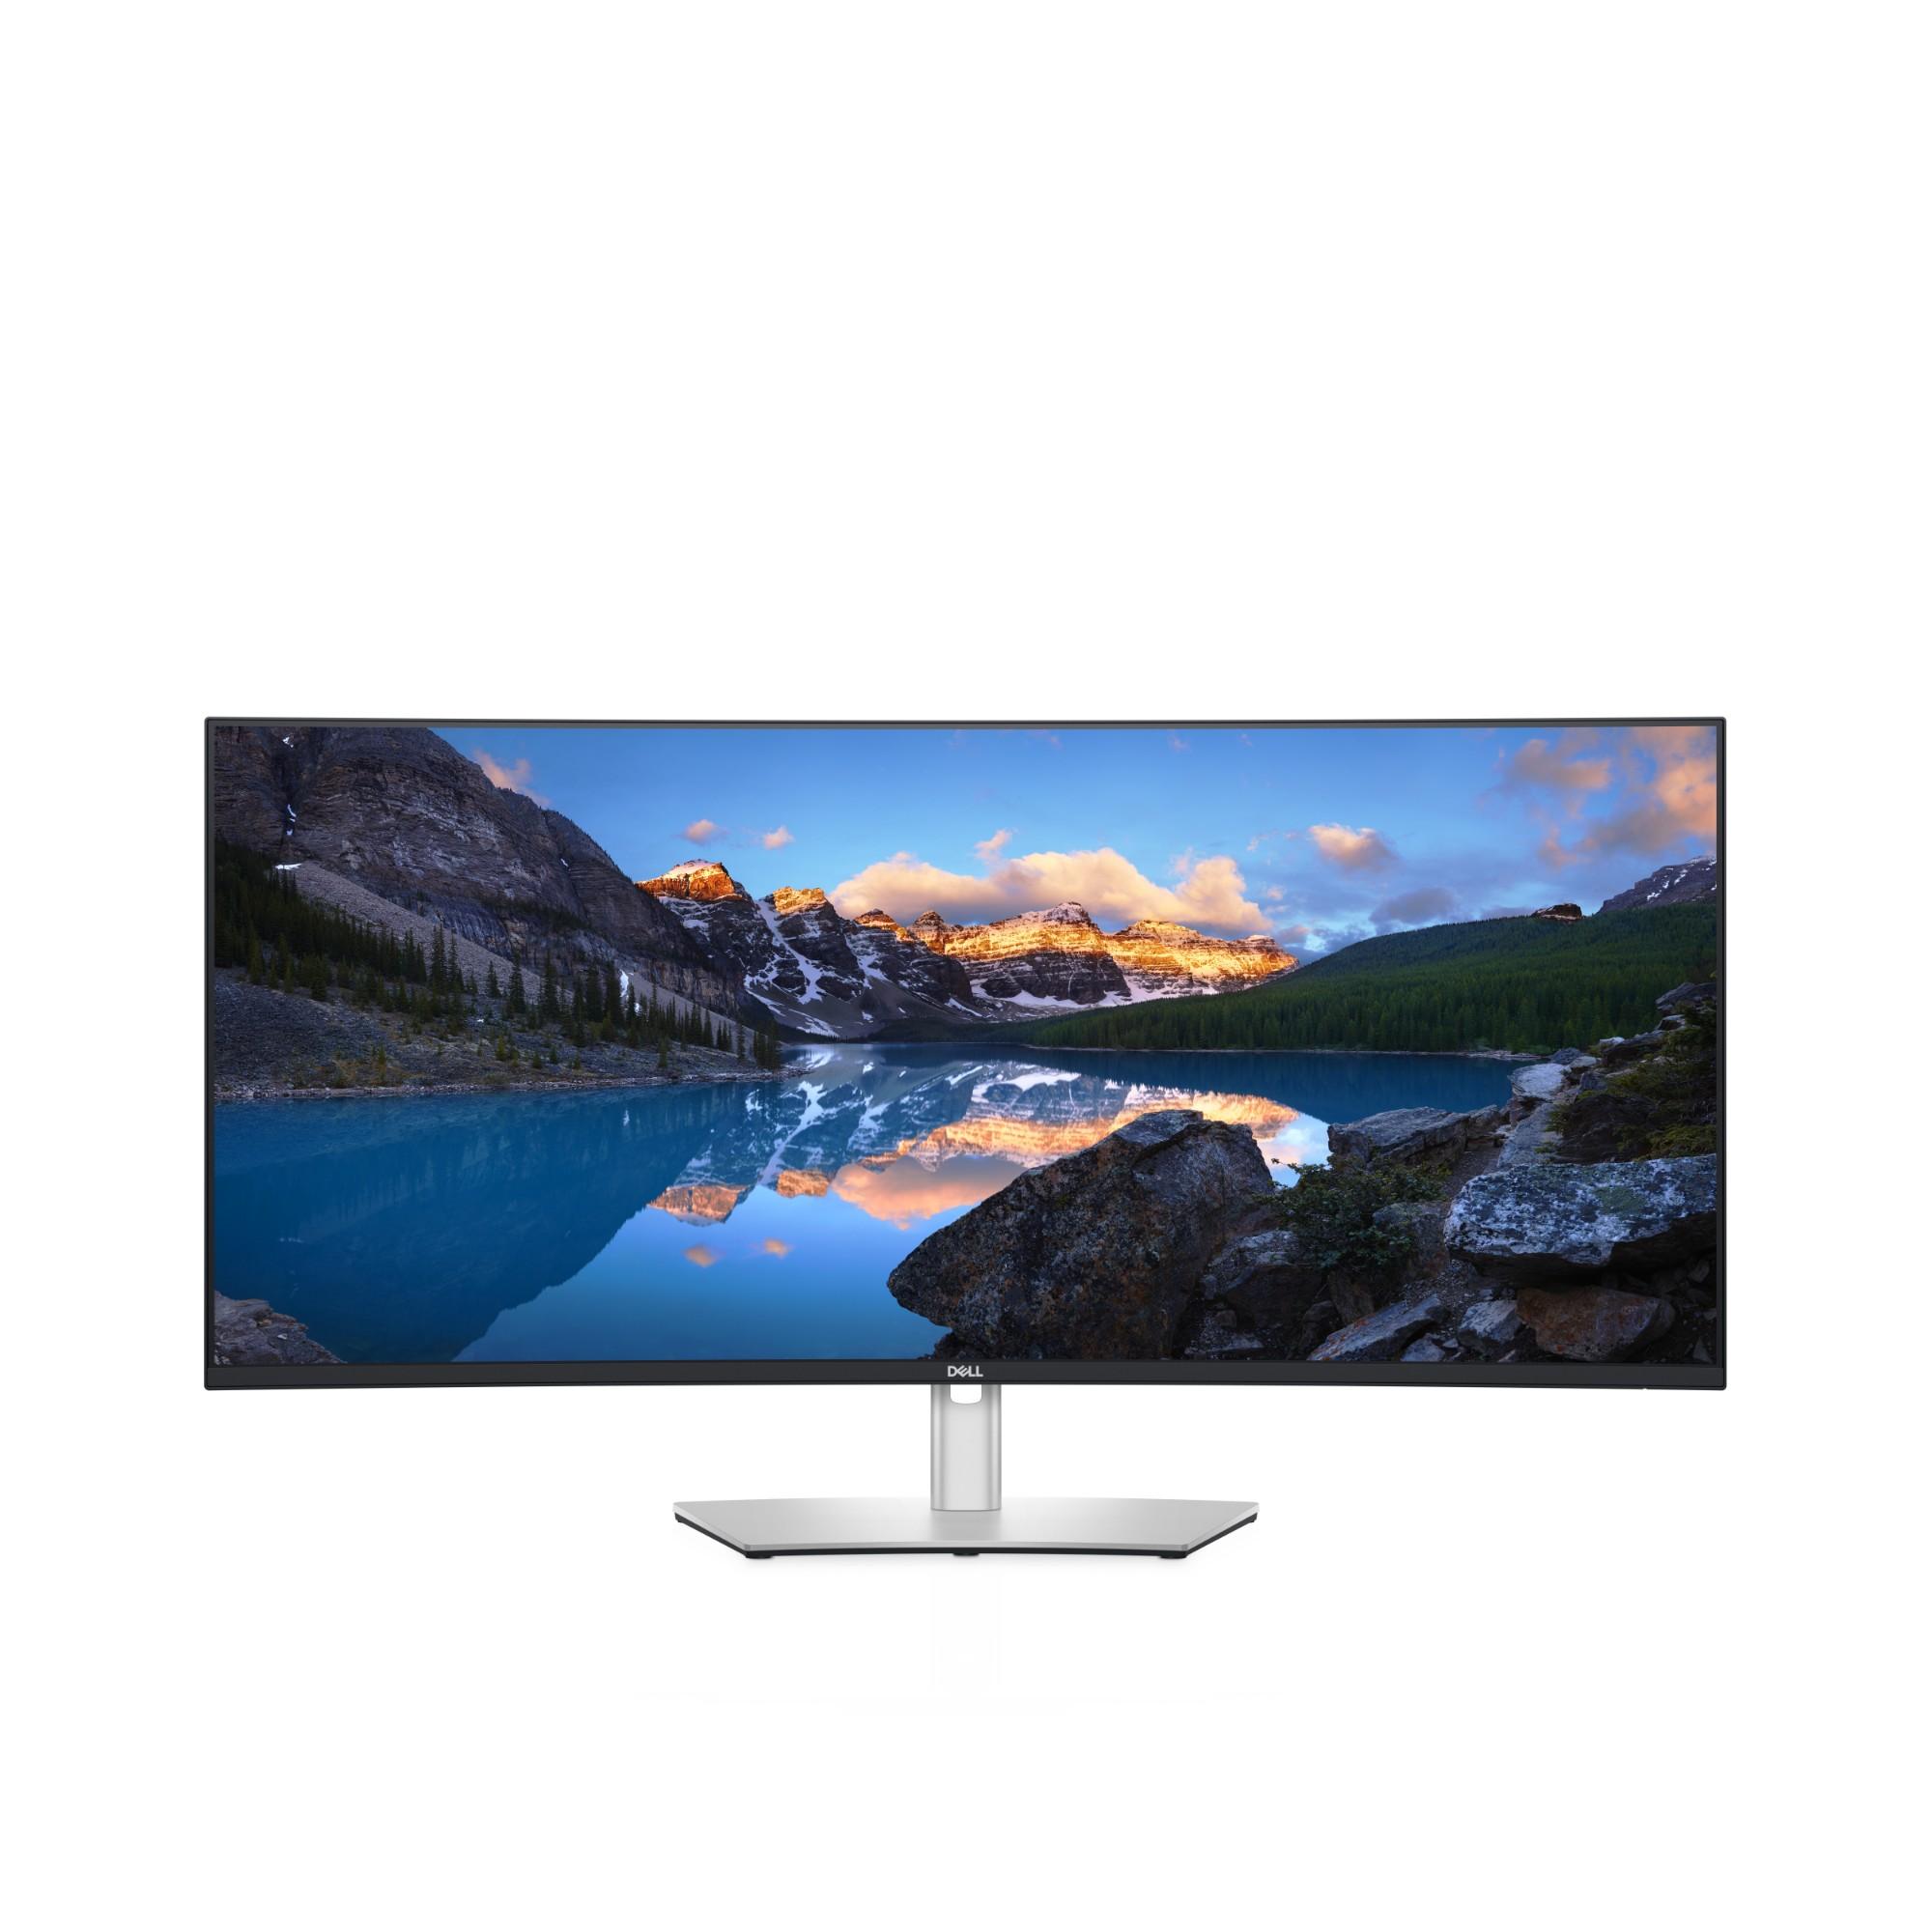 DELL UltraSharp U4021QW 100.8 cm (39.7